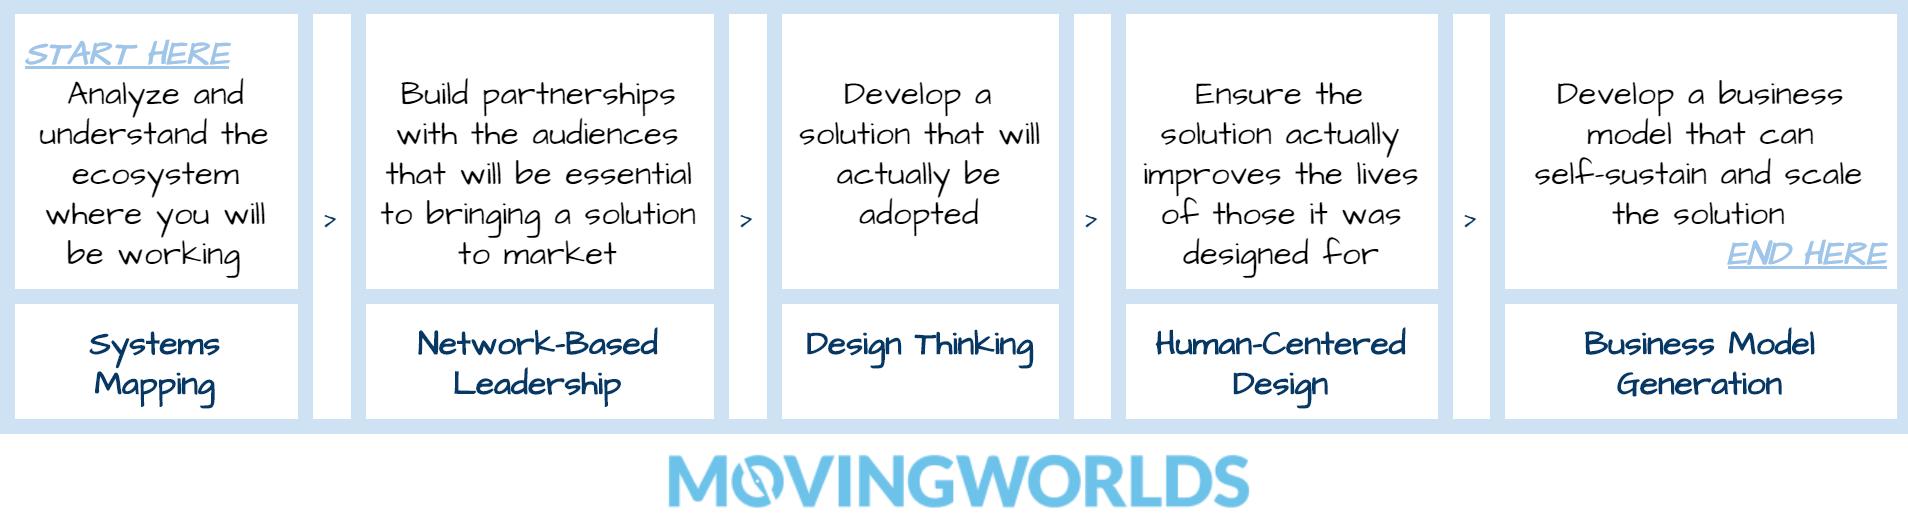 Design thinking and other frameworks for social enterprises